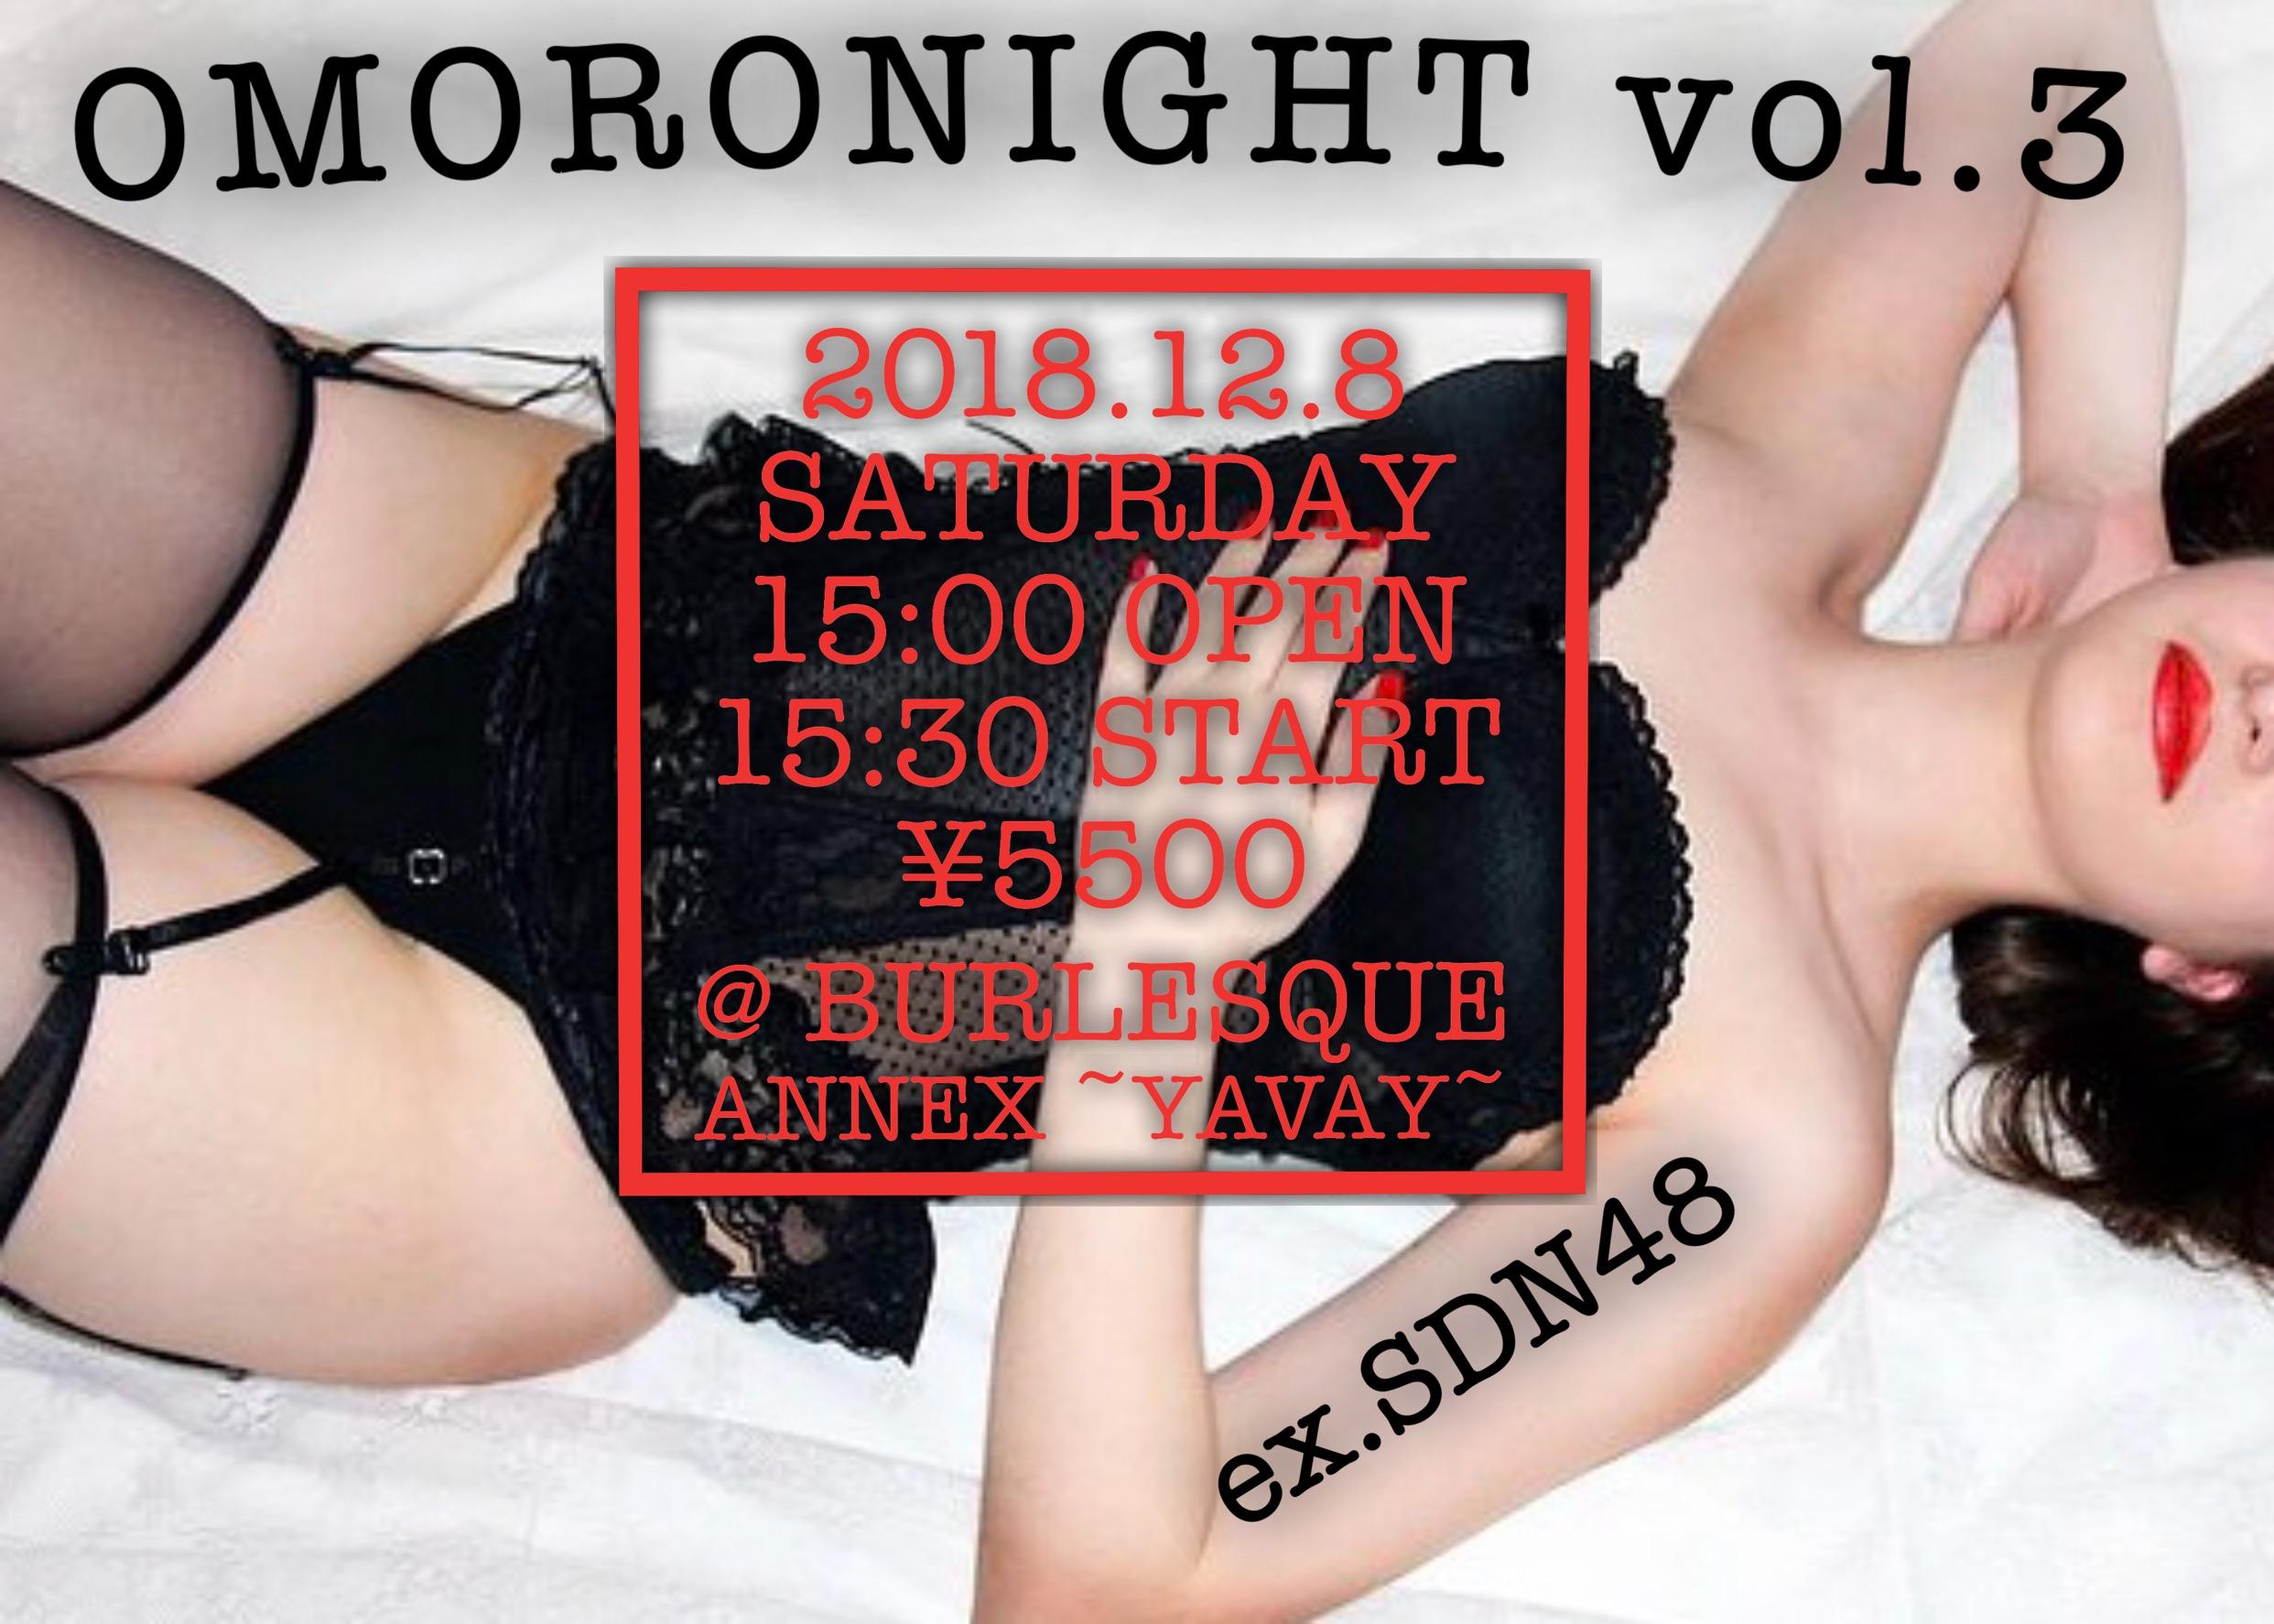 OMORO NIGHT!!〜Vol.3〜 細田海友専用チケット購入ページ